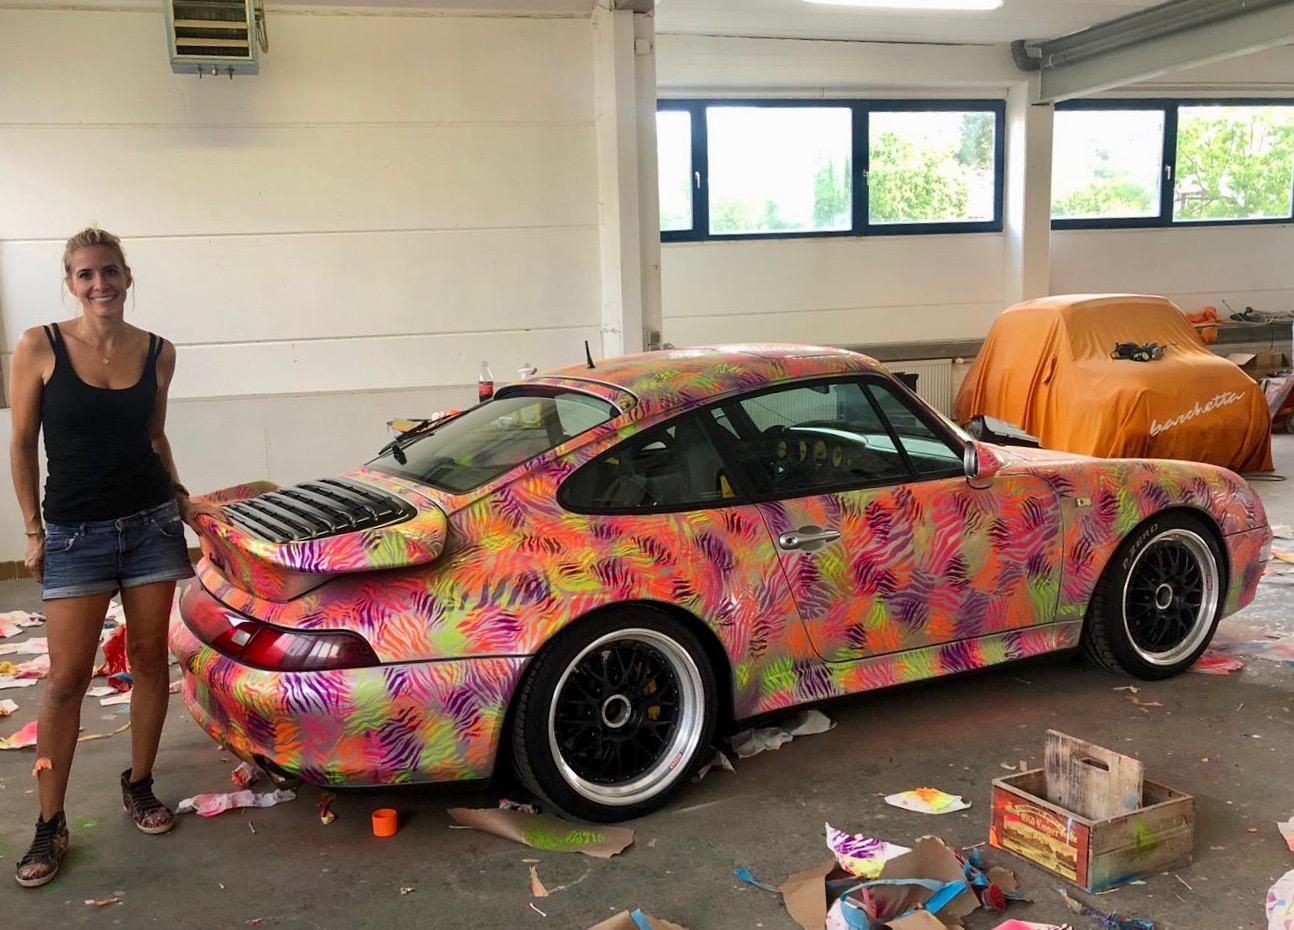 Steffen Retzlaff, Diana Eger, dianaeger, Artcar, art, Frankfurt, Porsche, 993, Popart, kunst, PorscheTurbo